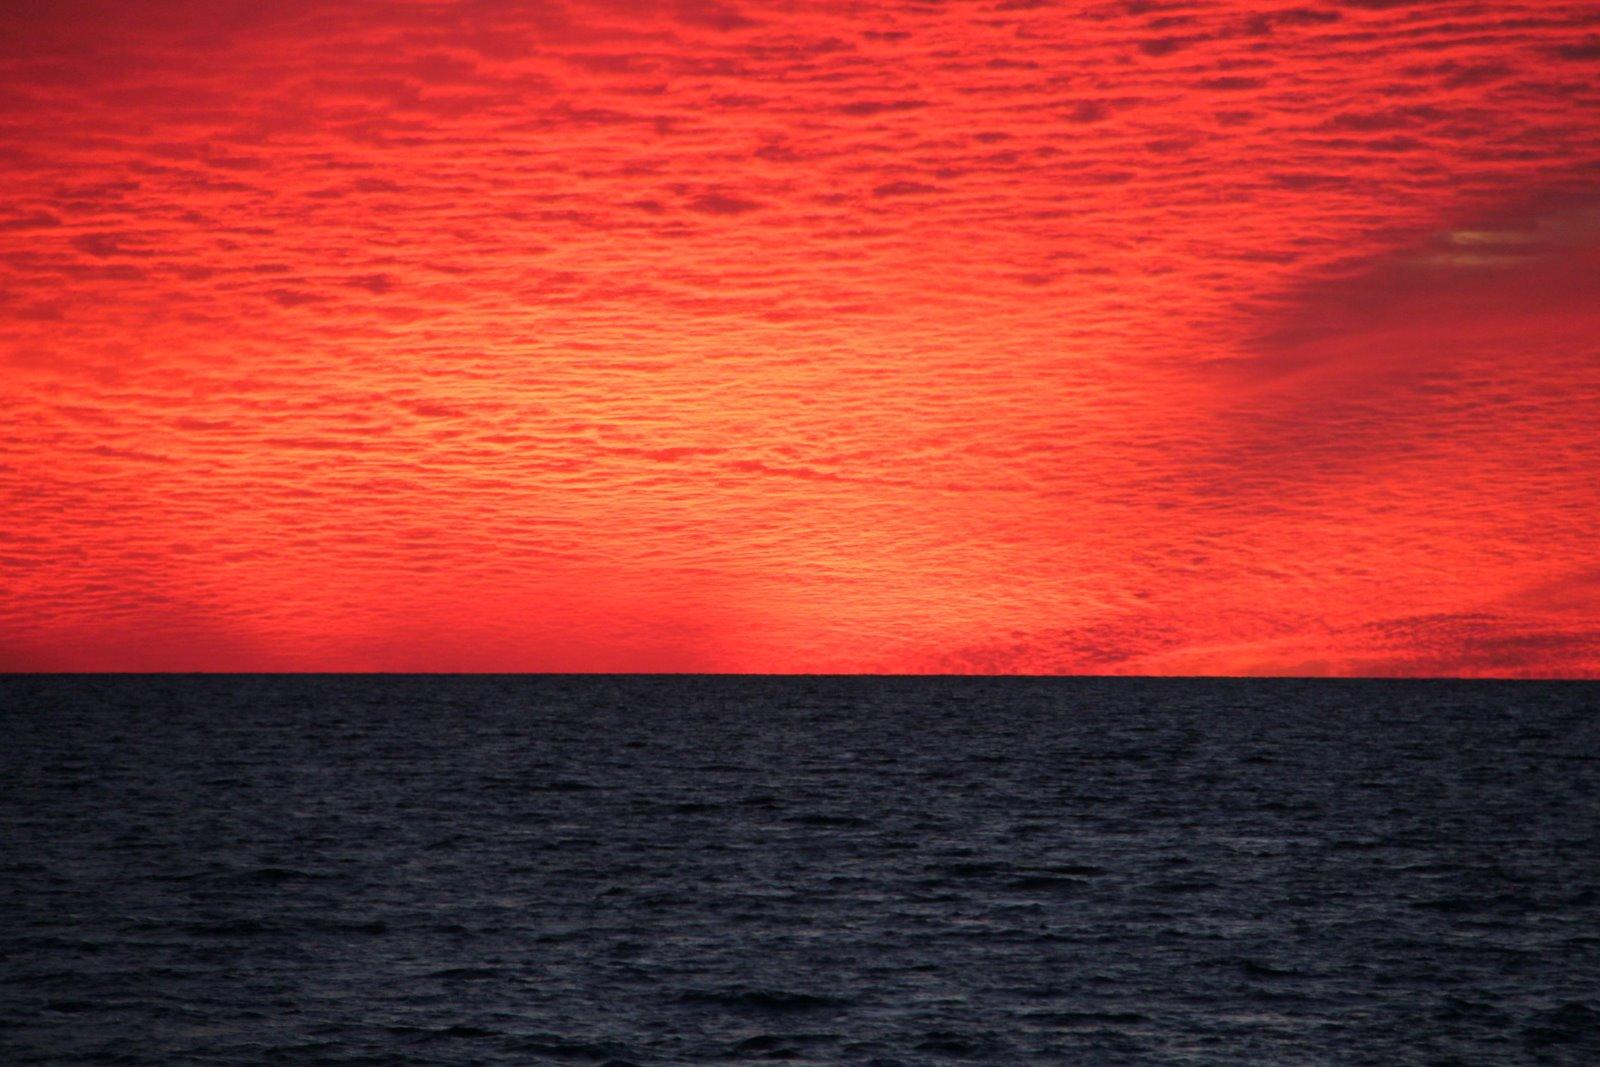 http://4.bp.blogspot.com/_ACqosfZ7yY4/TUI4ktWlY3I/AAAAAAACi3w/UxLqlASqaSc/s1600/Panama%252BCity%252BBeach-Sunset-IMG_4523-.JPG